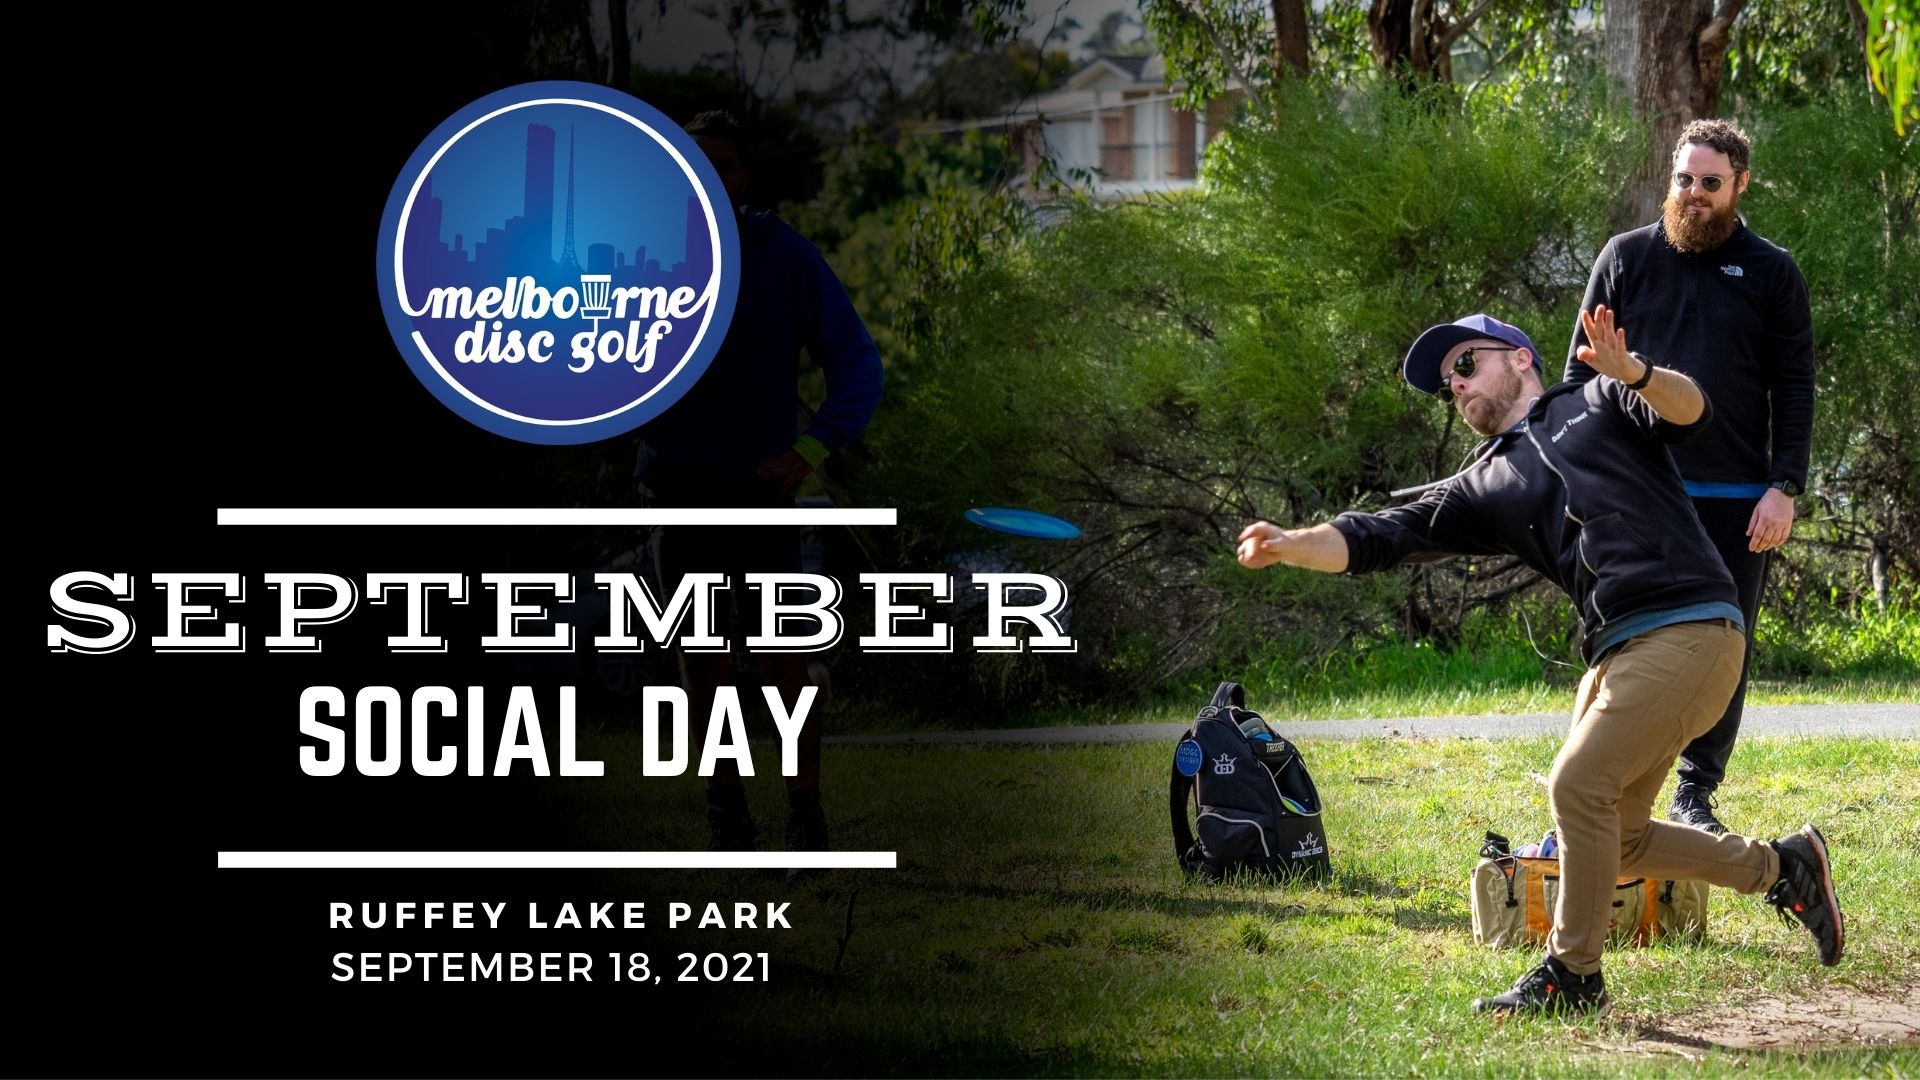 November Social Disc Golf Day at Ruffey Lake Park in Doncaster